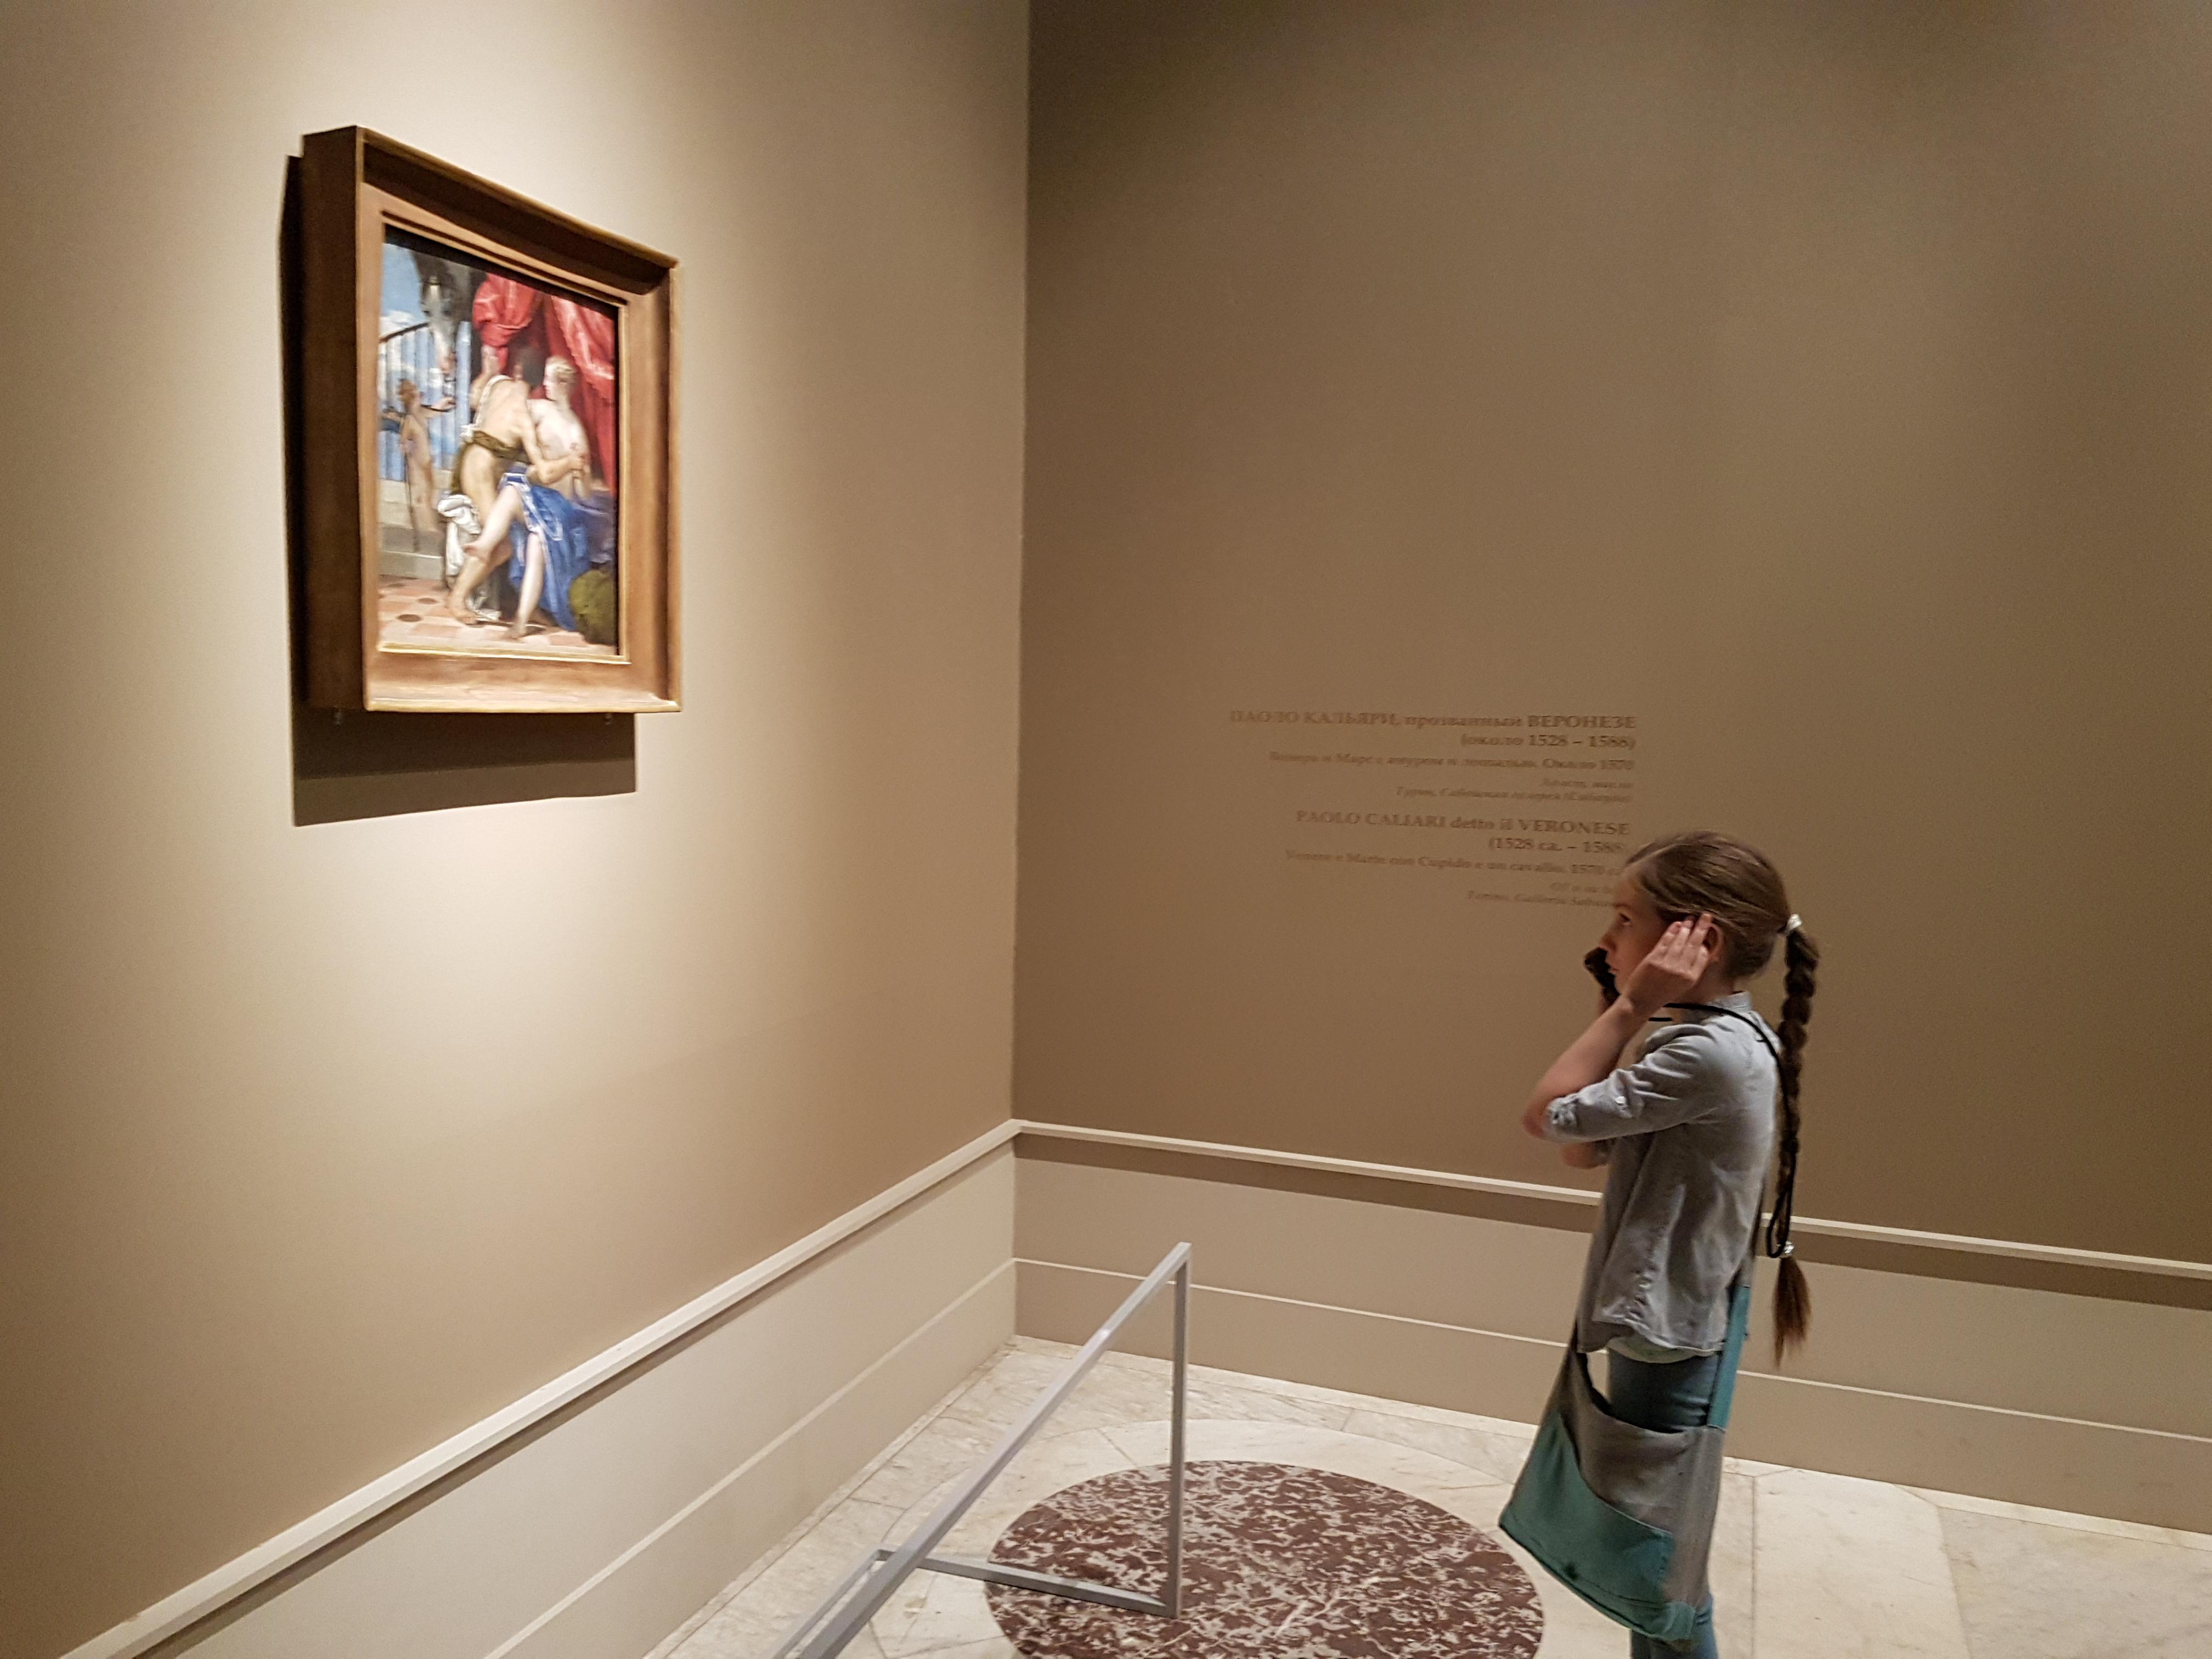 """Венера и Марс"" Веронезе на выставке ""Венеция Ренессанса. Тициан, Тинторетто, Веронезе"" в Пушкинском музее"